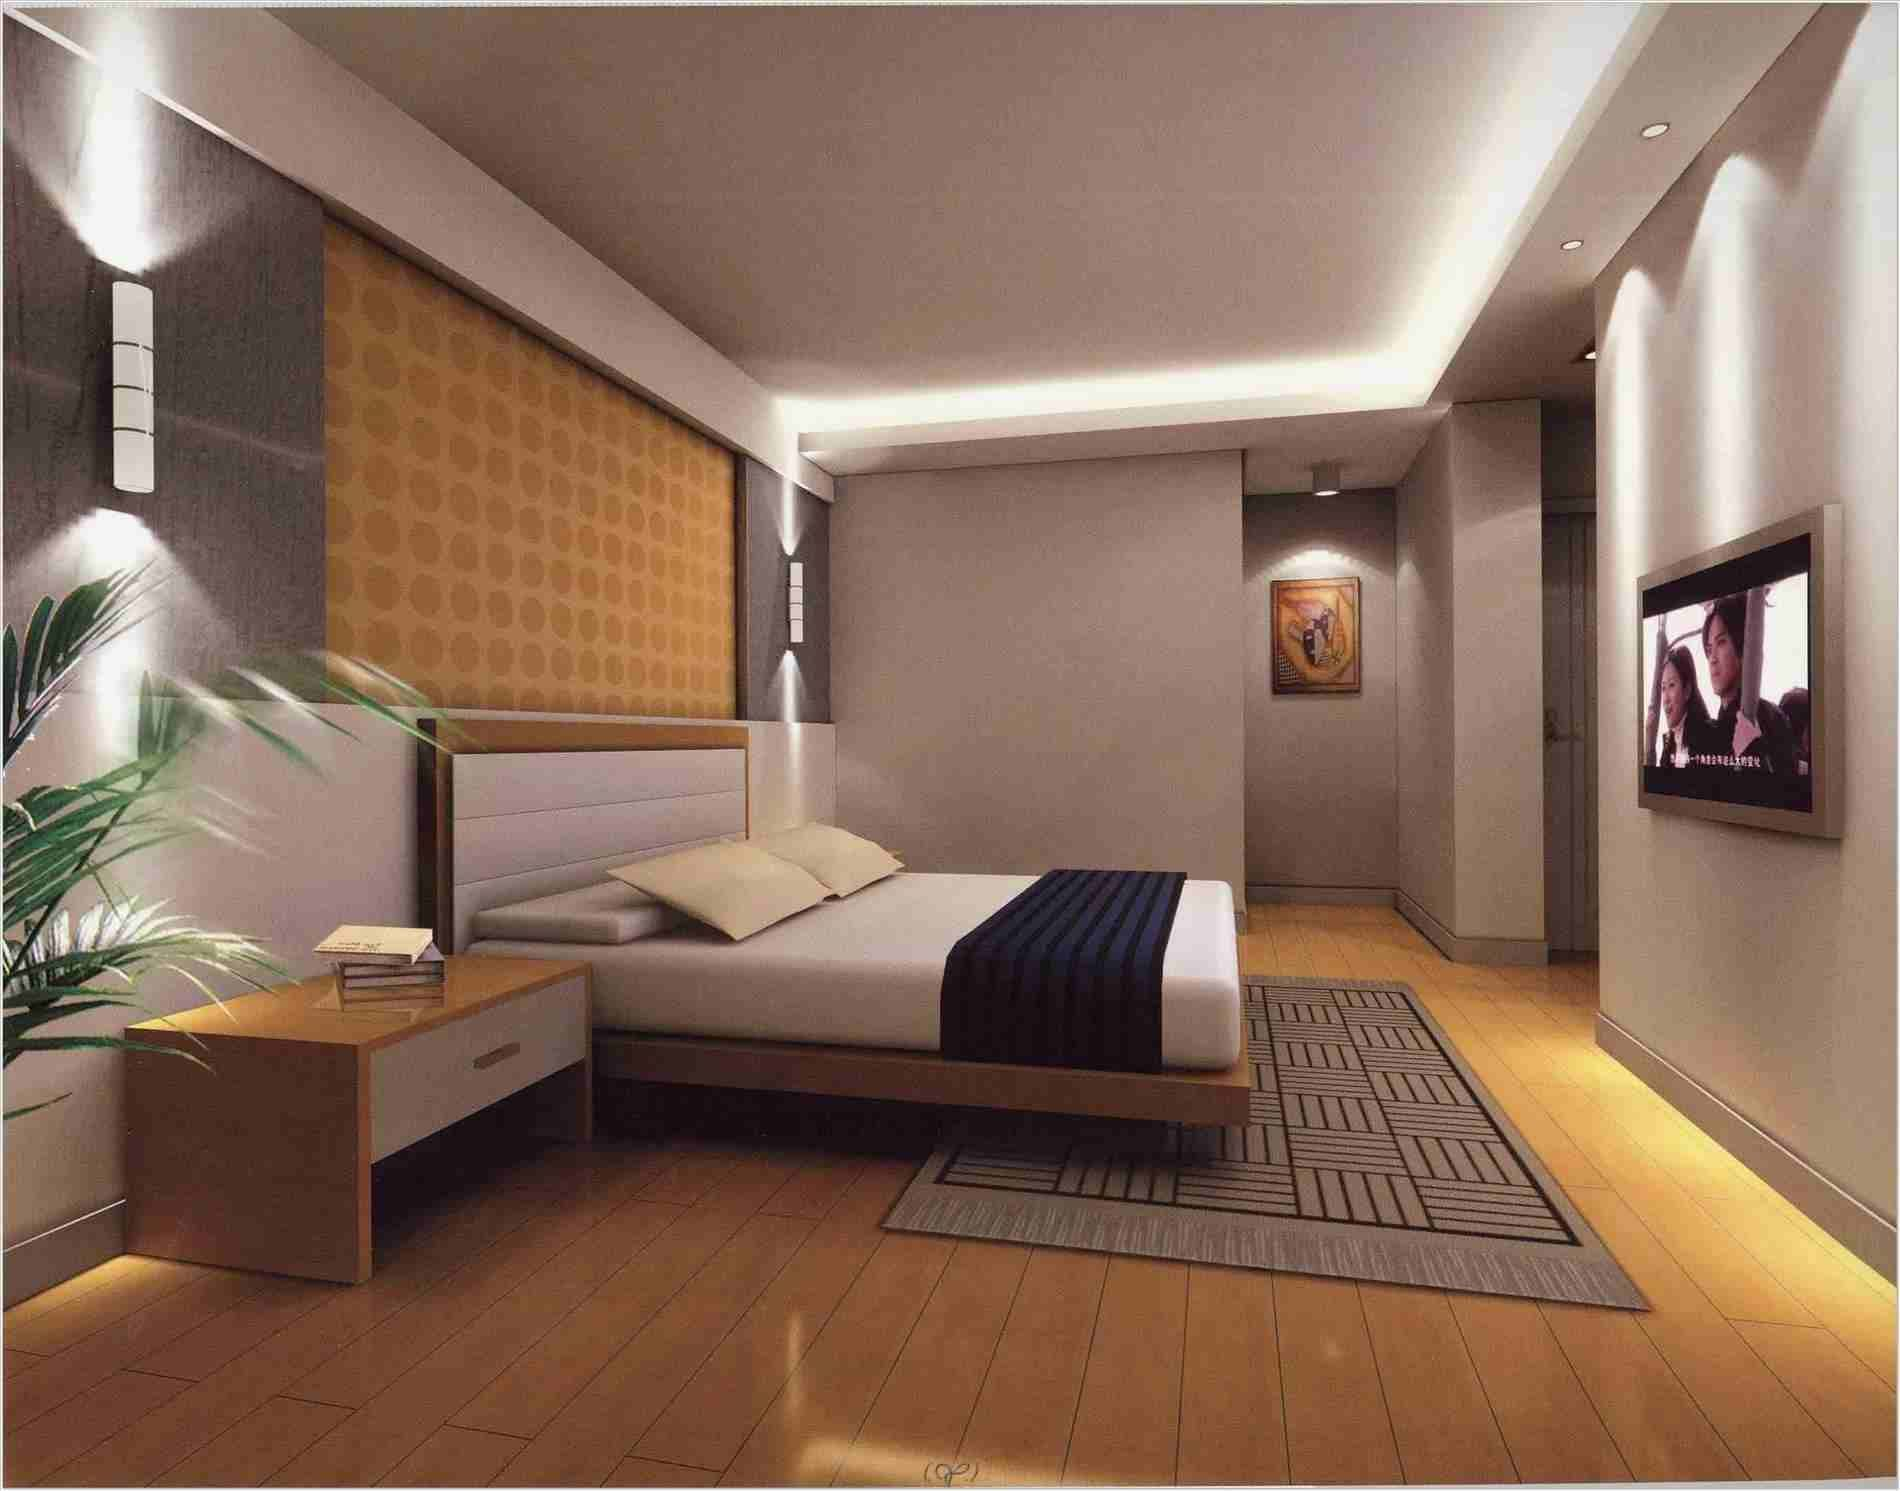 Modern Master Bedroom Layout Full Size Of Bedroom 2018 Modern Bedrooms Curtain Desig Rustic Master Bedroom Design Modern Master Bedroom Master Bedroom Design